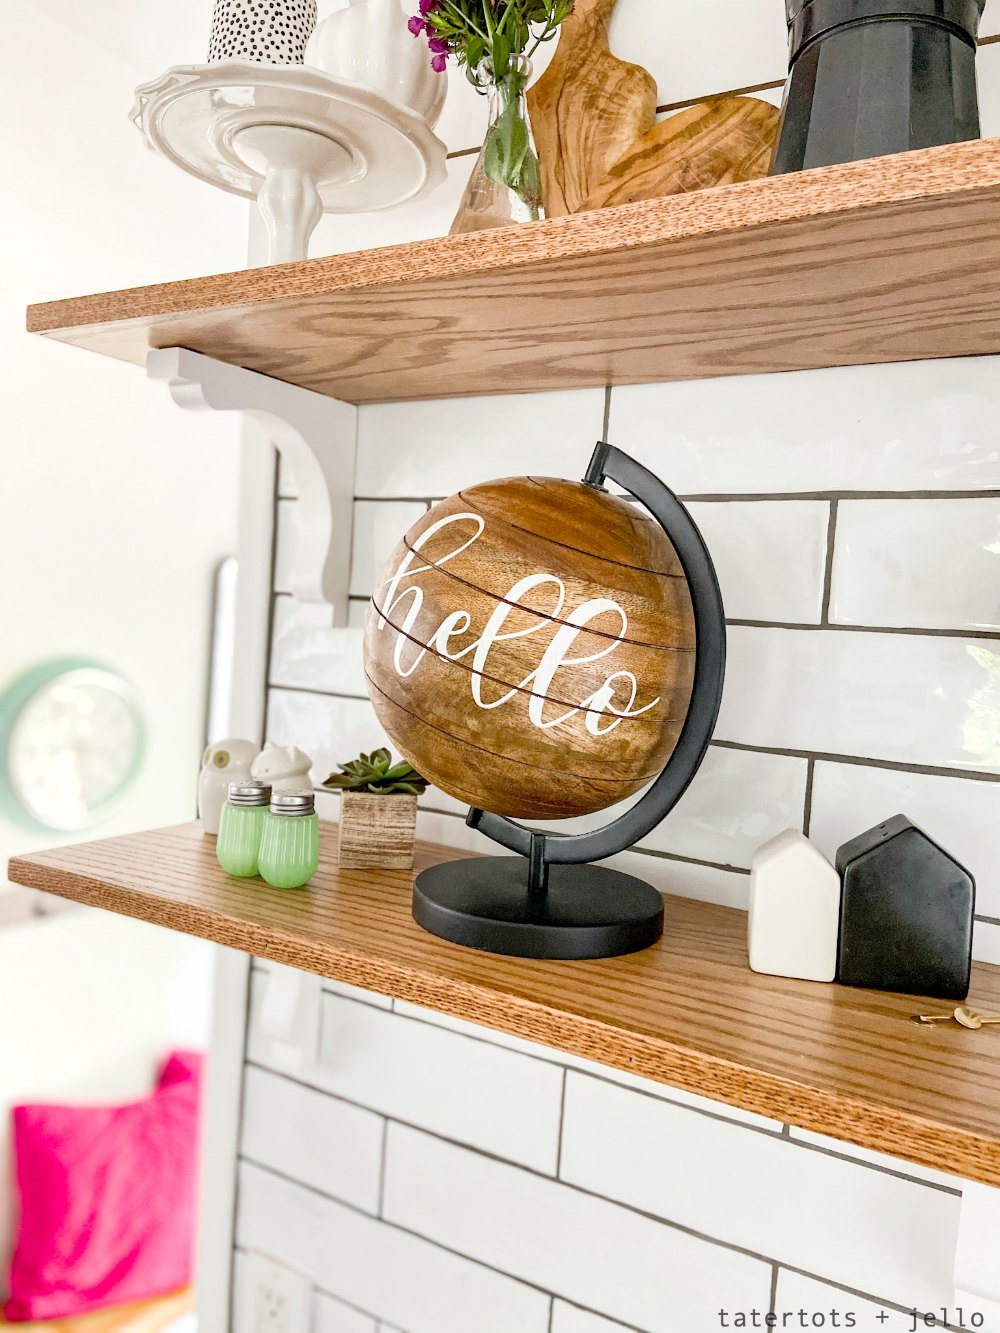 cottage kitchen shelf styling for summer.